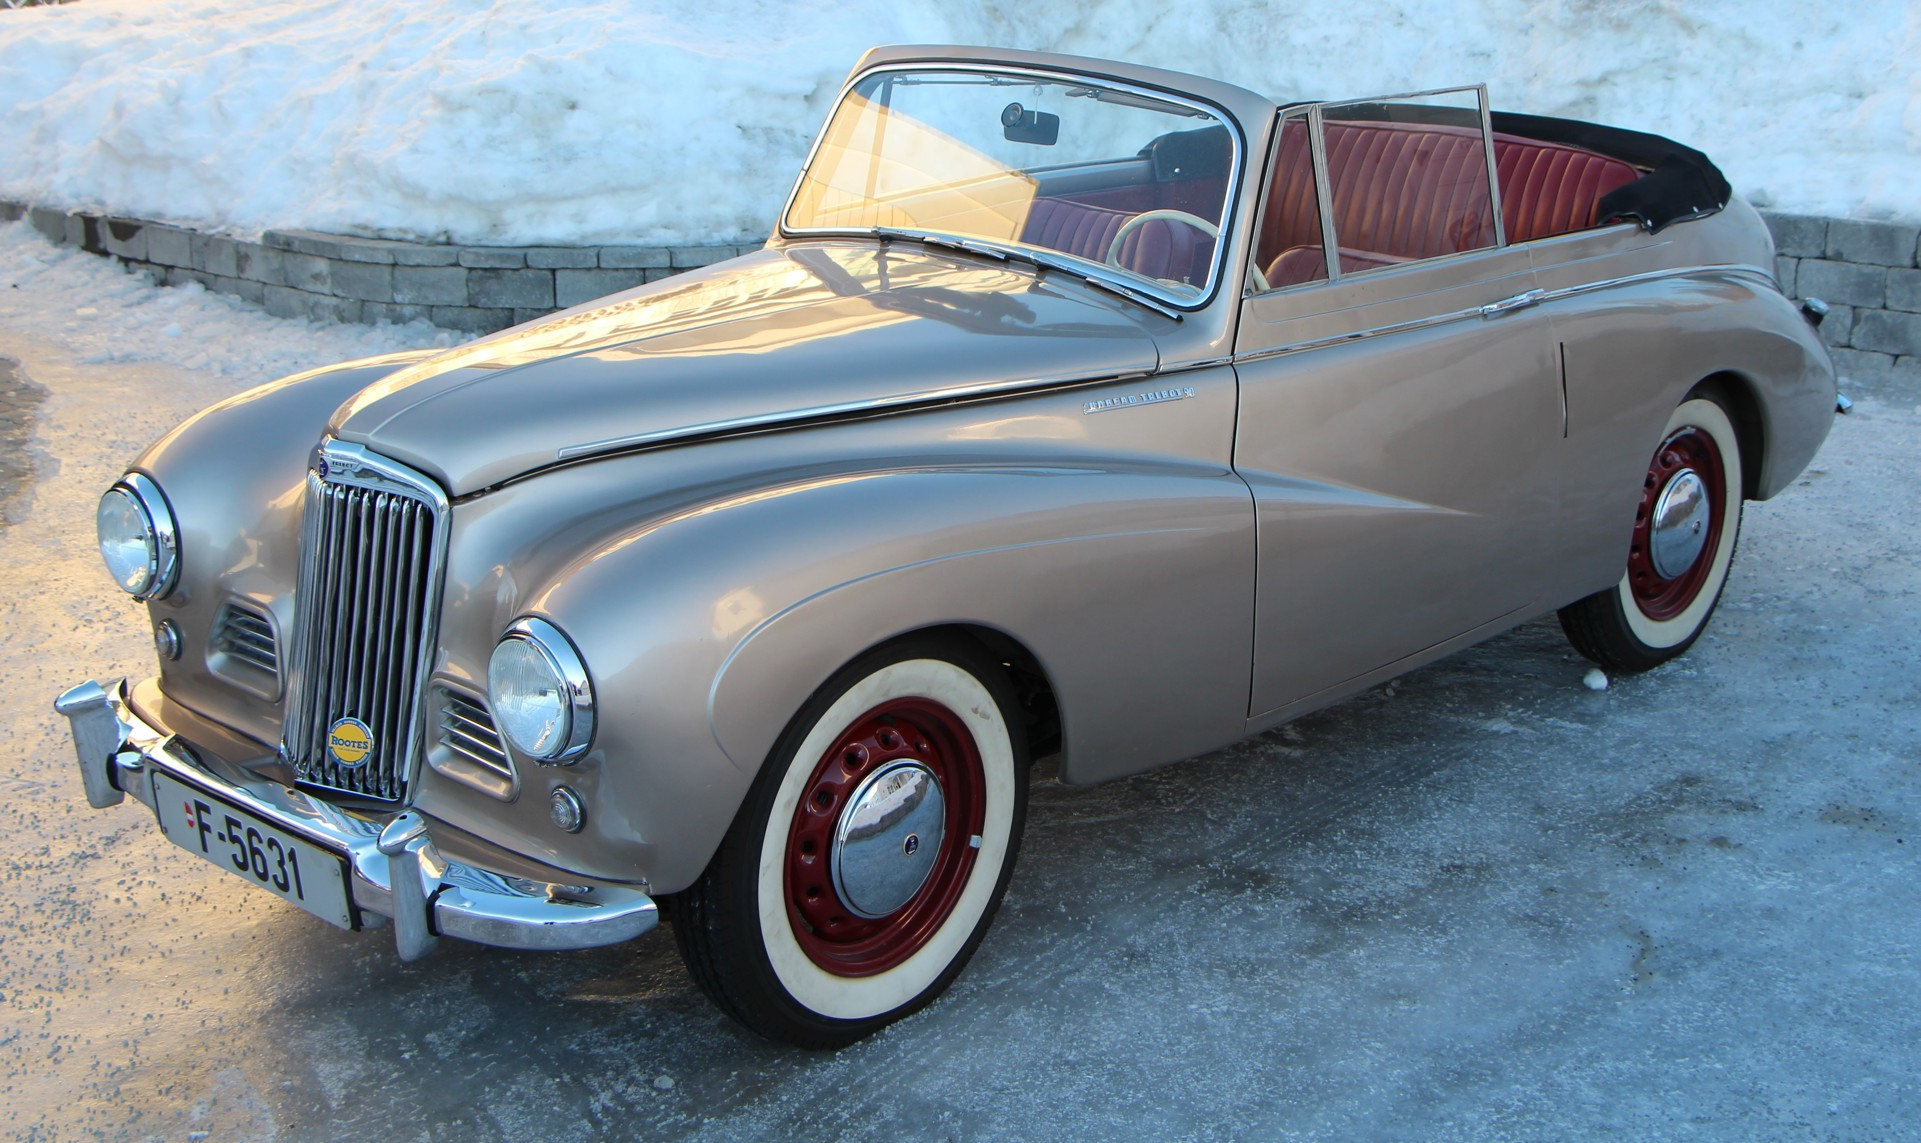 1953 Sunbeam Talbot DHC.JPG